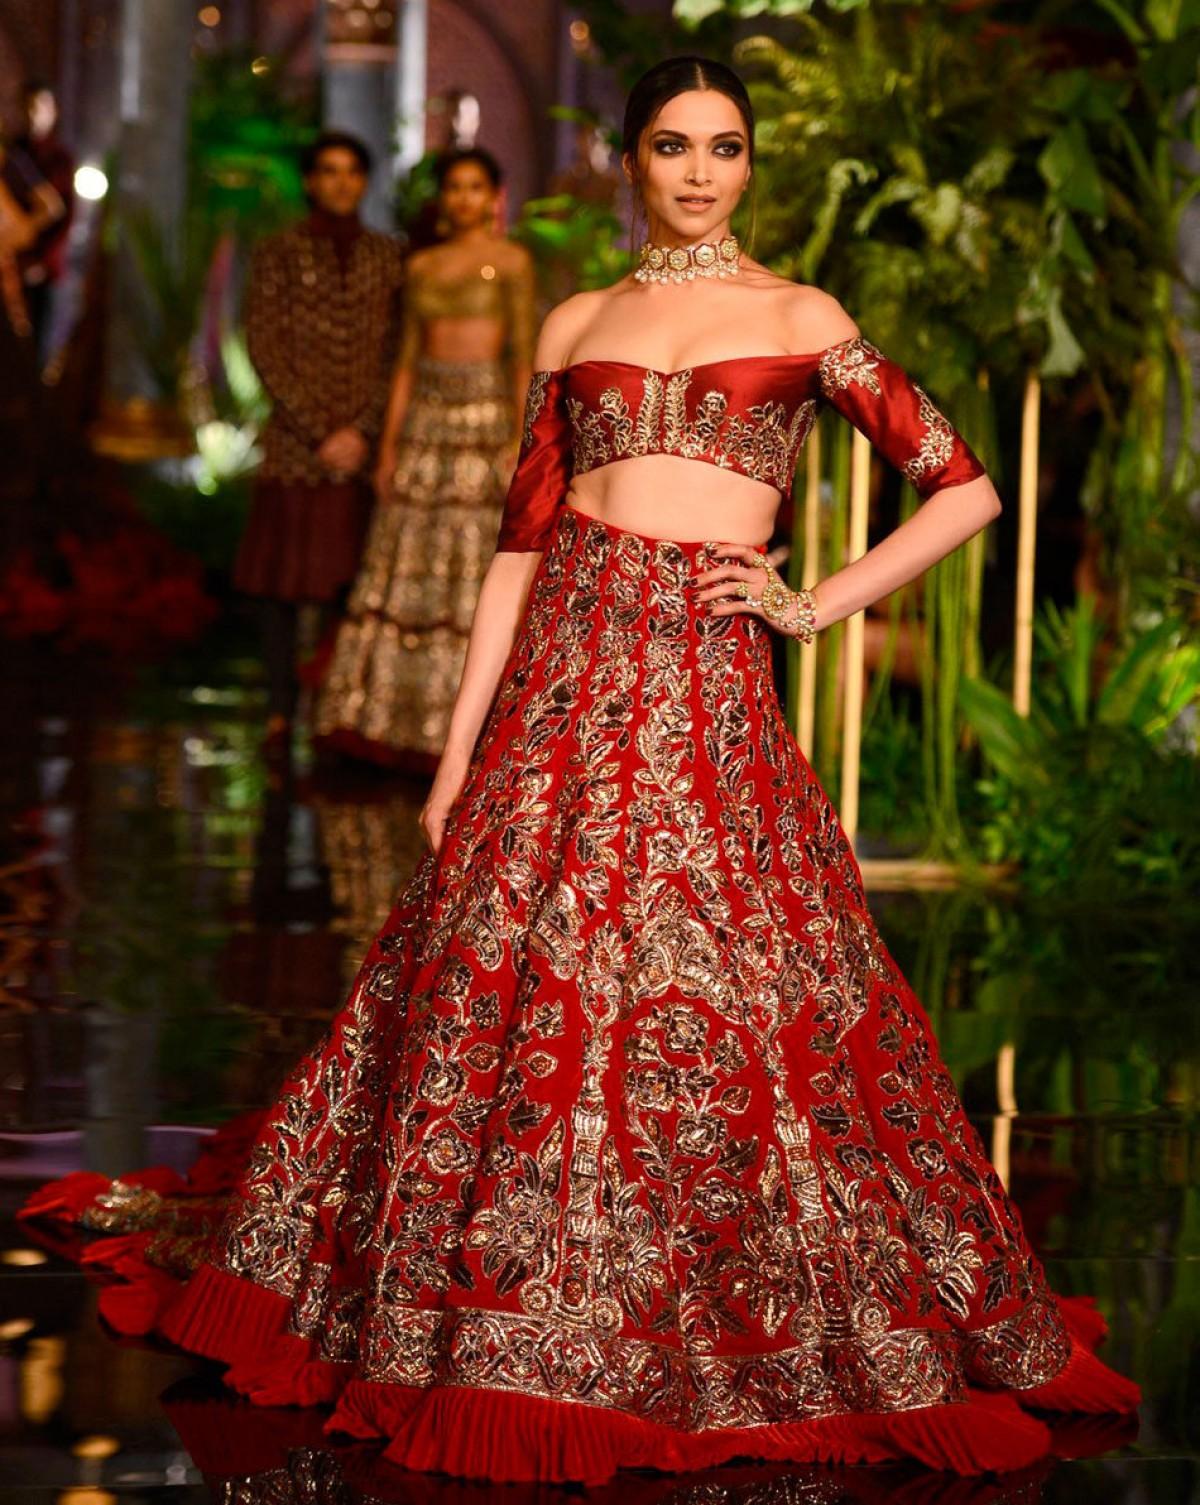 Manish Malhotra birthday: Designer throws stylish bash on 50th